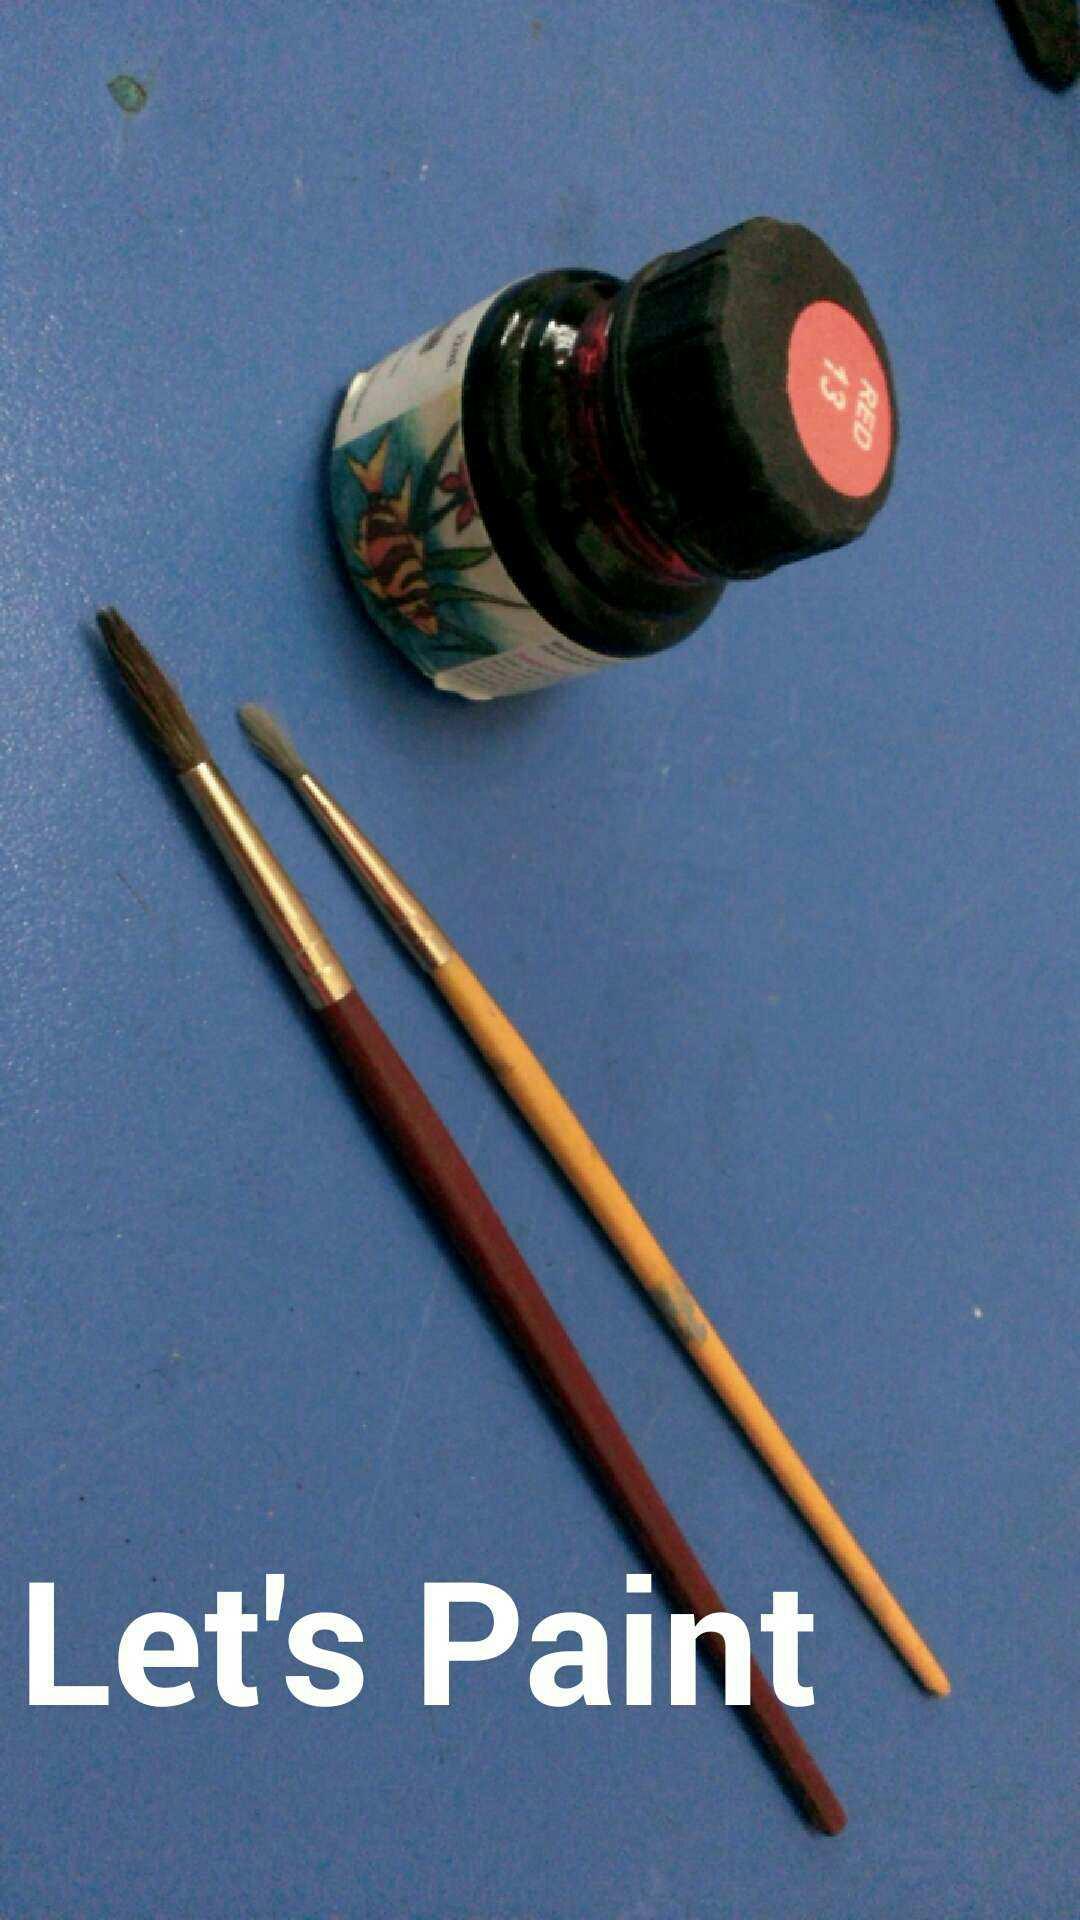 how-to-glasspaint-islamic-calligraphy-wall-art-ideas